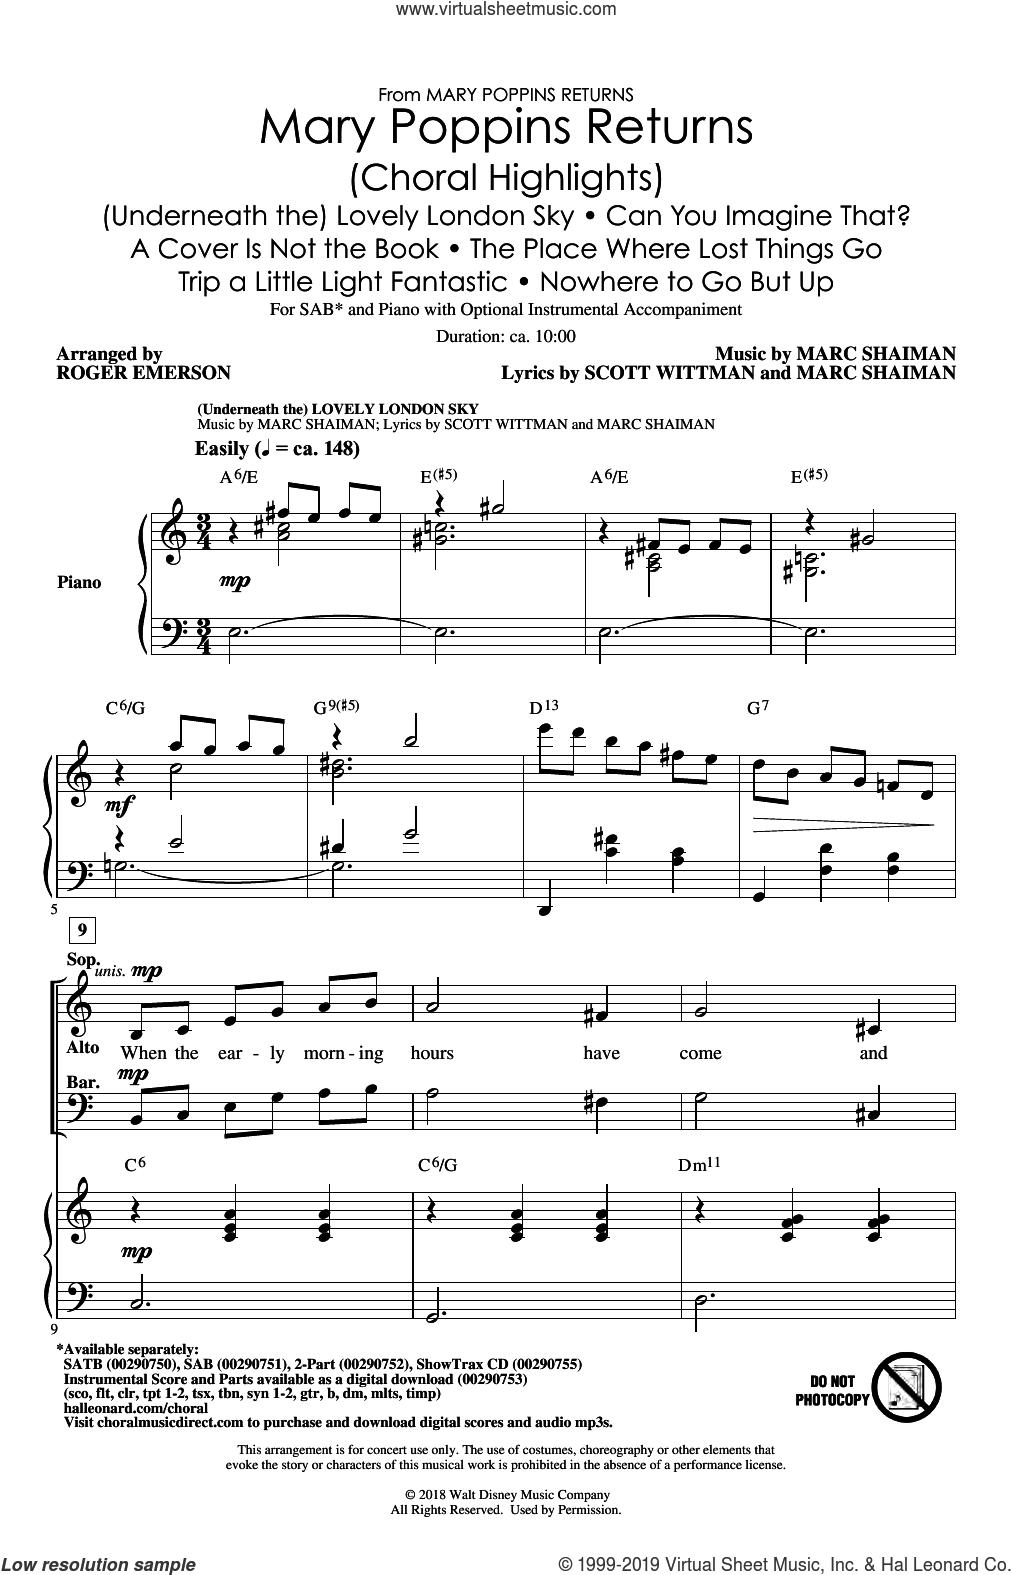 Mary Poppins Returns (Choral Highlights) (arr. Roger Emerson) sheet music for choir (SAB: soprano, alto, bass) by Marc Shaiman, Roger Emerson, Marc Shaiman & Scott Wittman and Scott Wittman, intermediate skill level